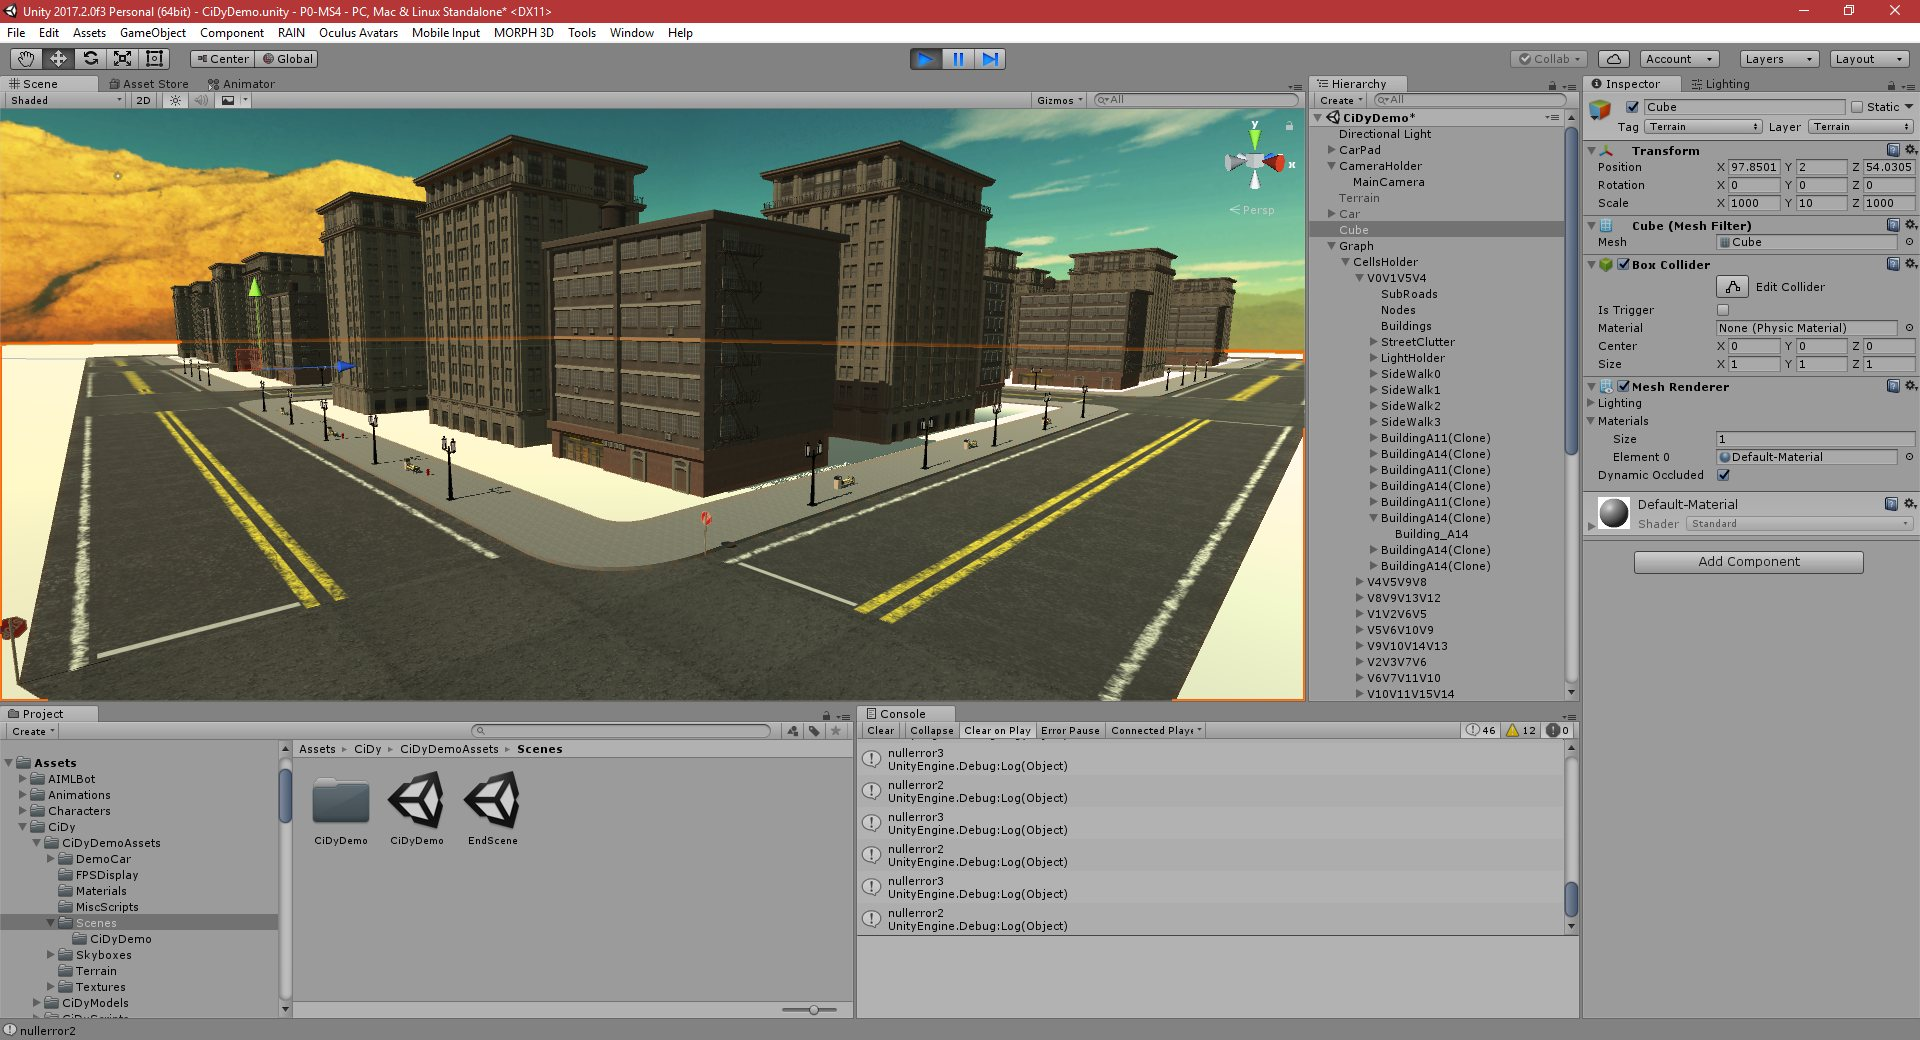 P0-MS5: Part 301: City Simulator - PGD Home